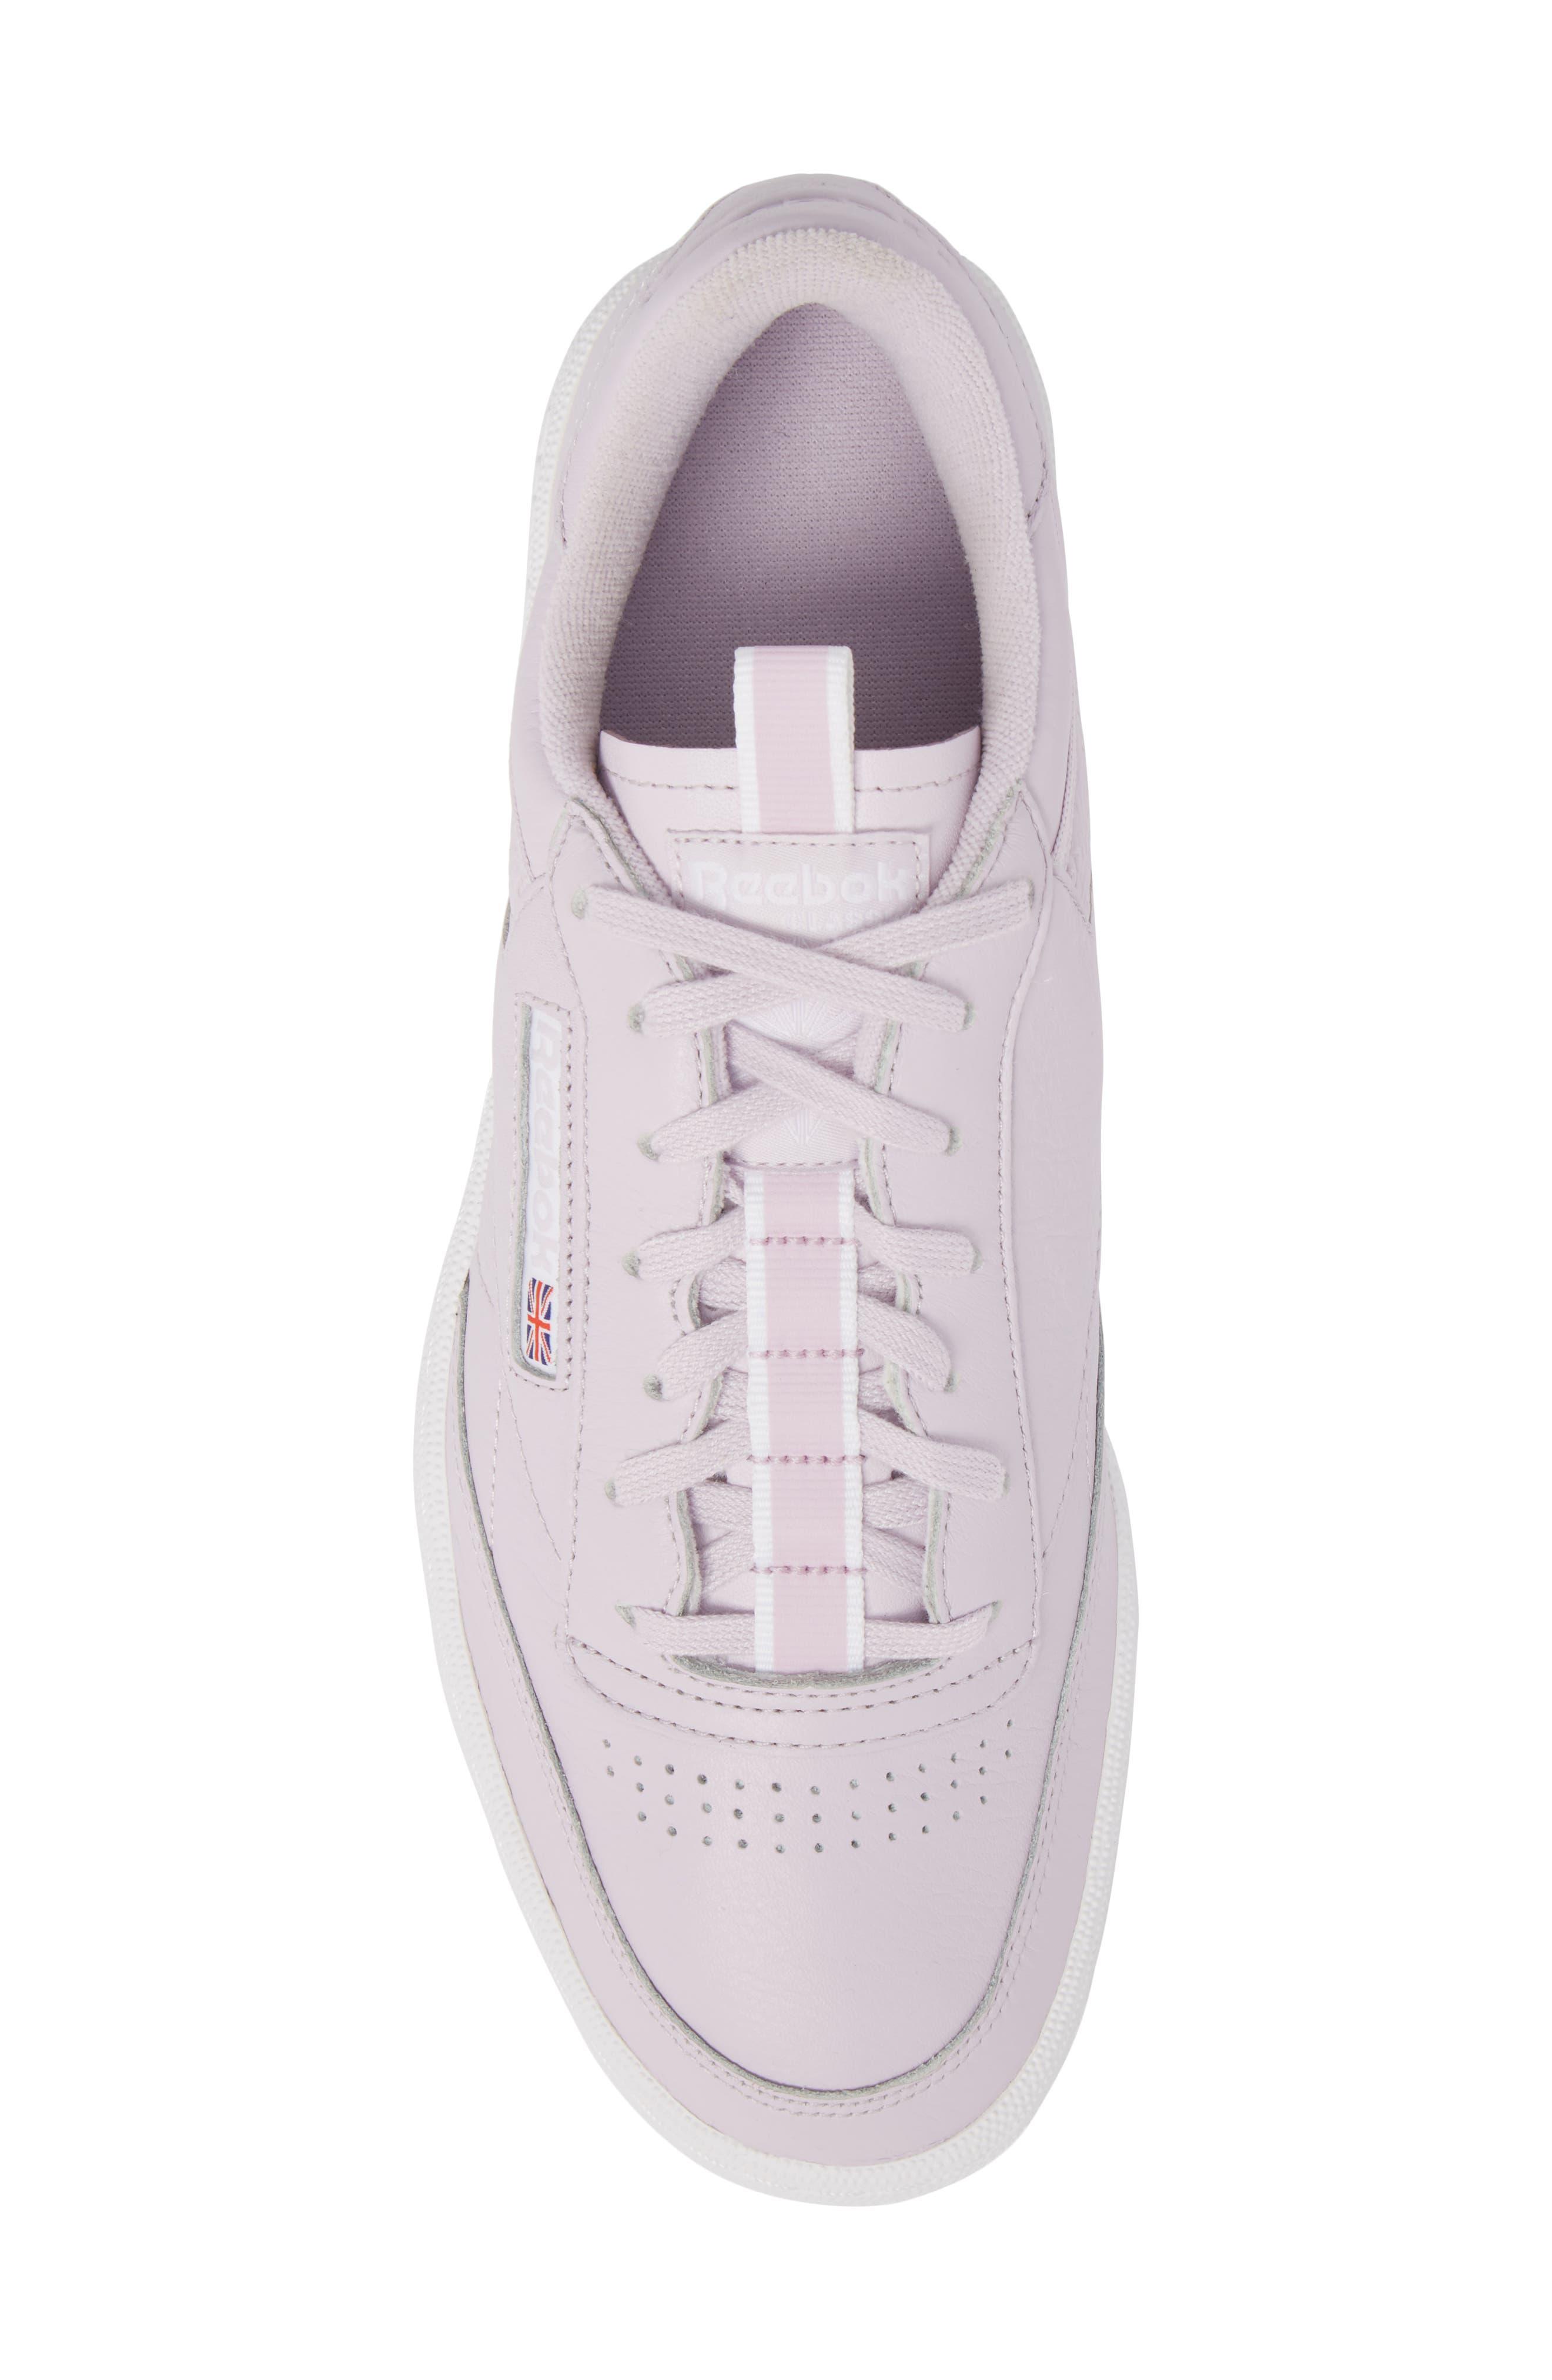 Club C 85 RT Sneaker,                             Alternate thumbnail 5, color,